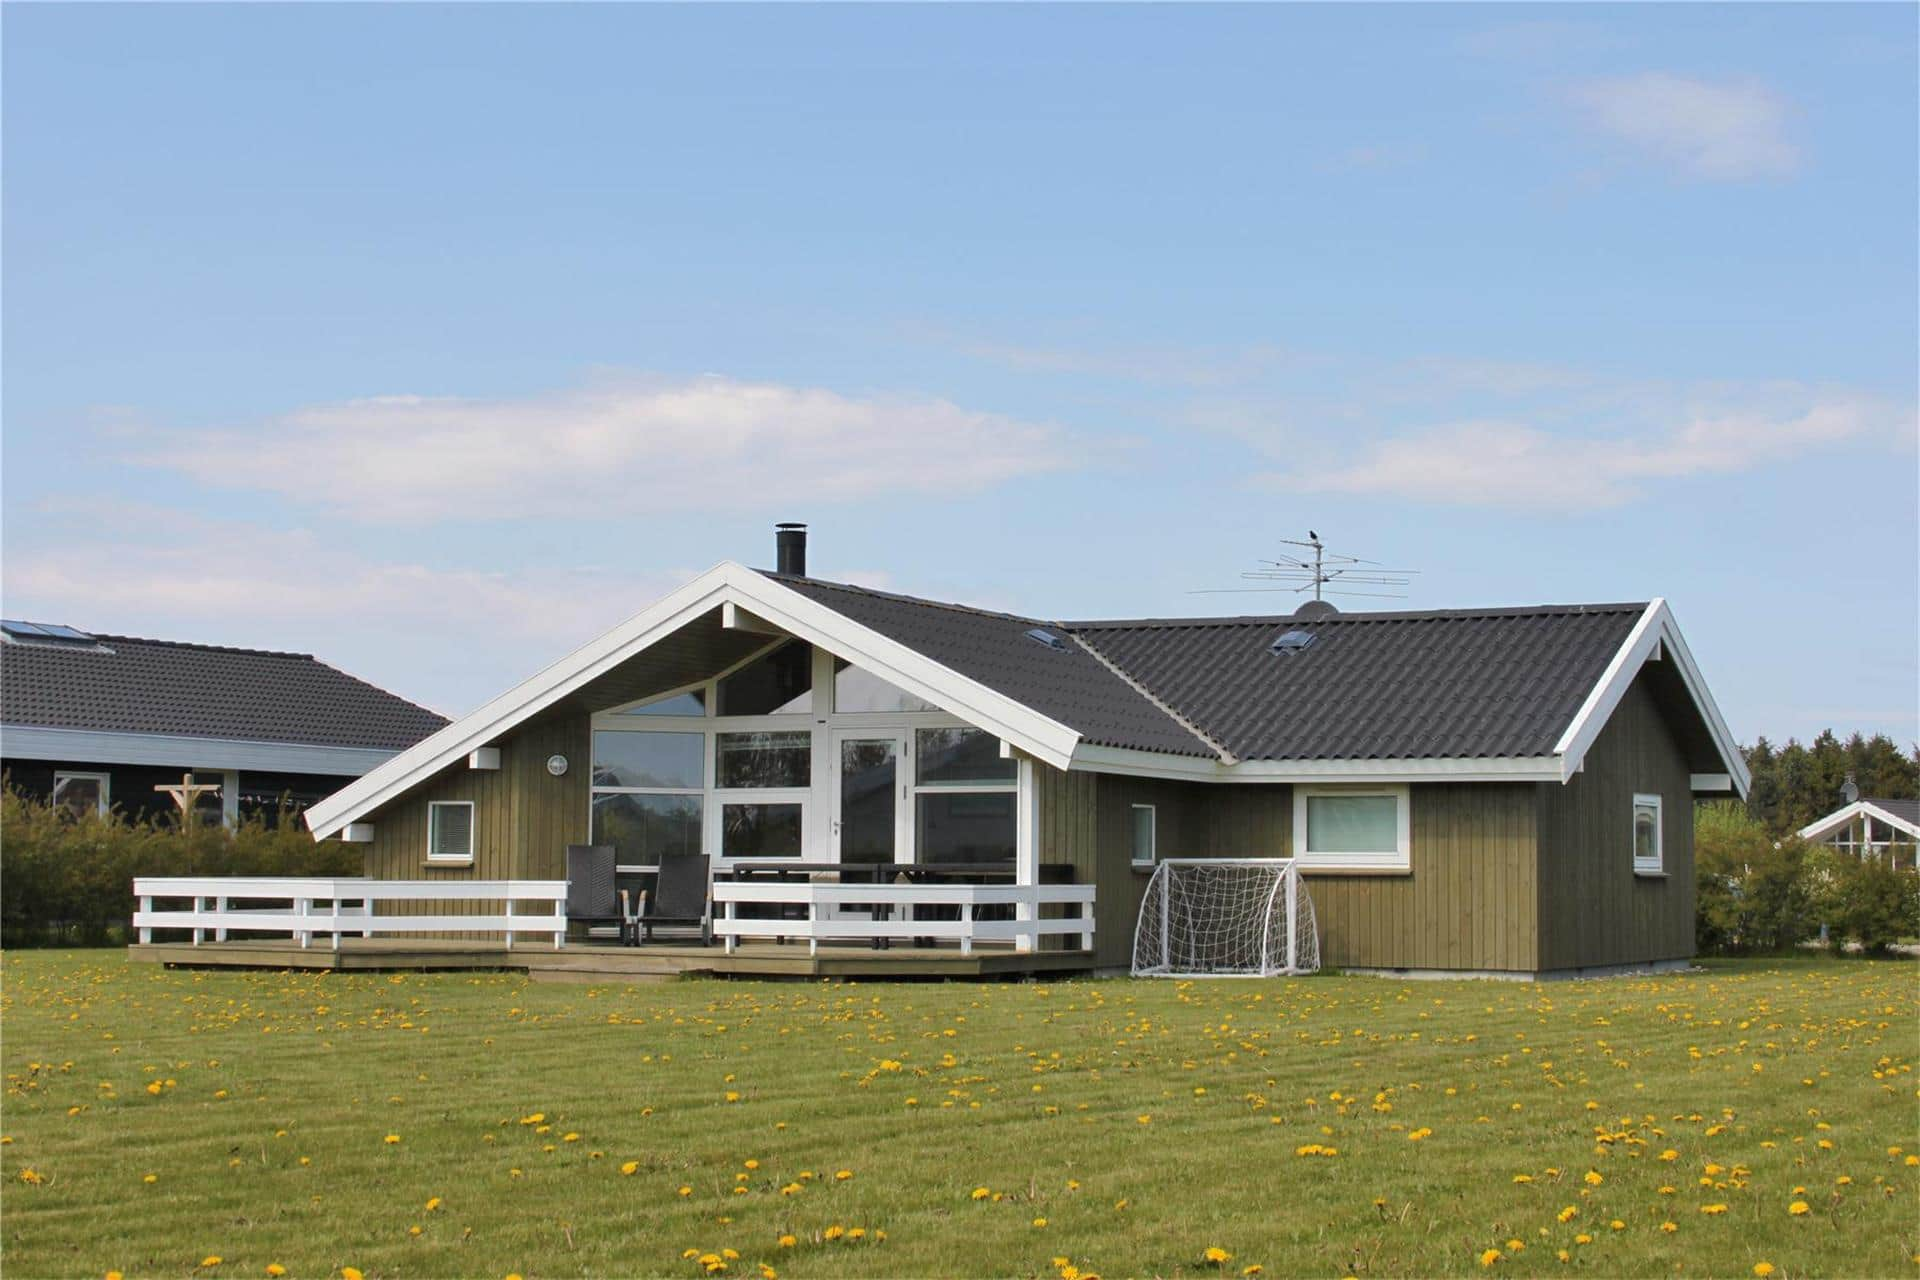 Billede 1-3 Sommerhus M645580, Strandparken 25, DK - 5450 Otterup